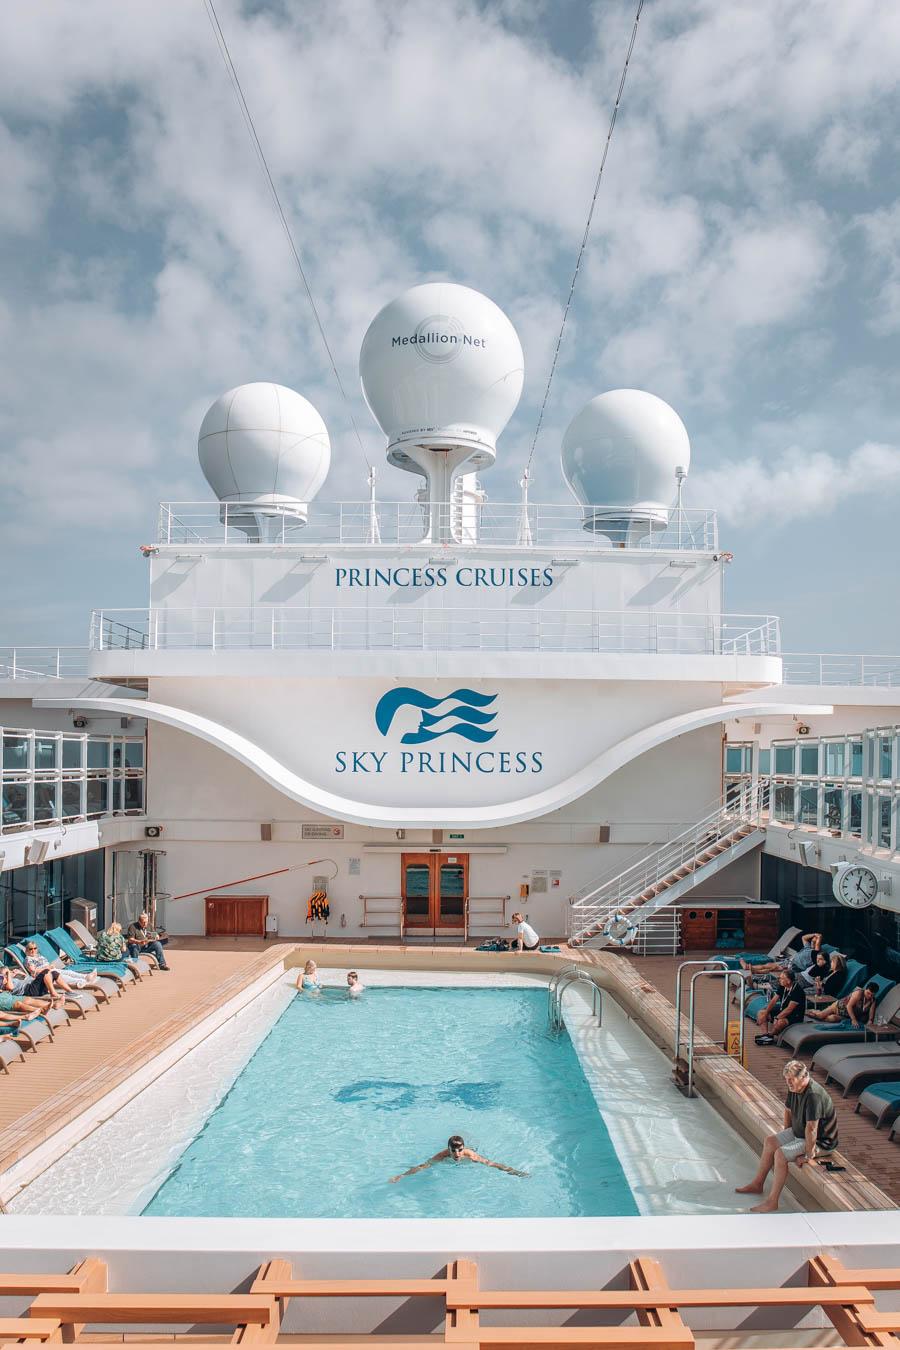 Swimming pool view of Princess Cruises Sky Princess